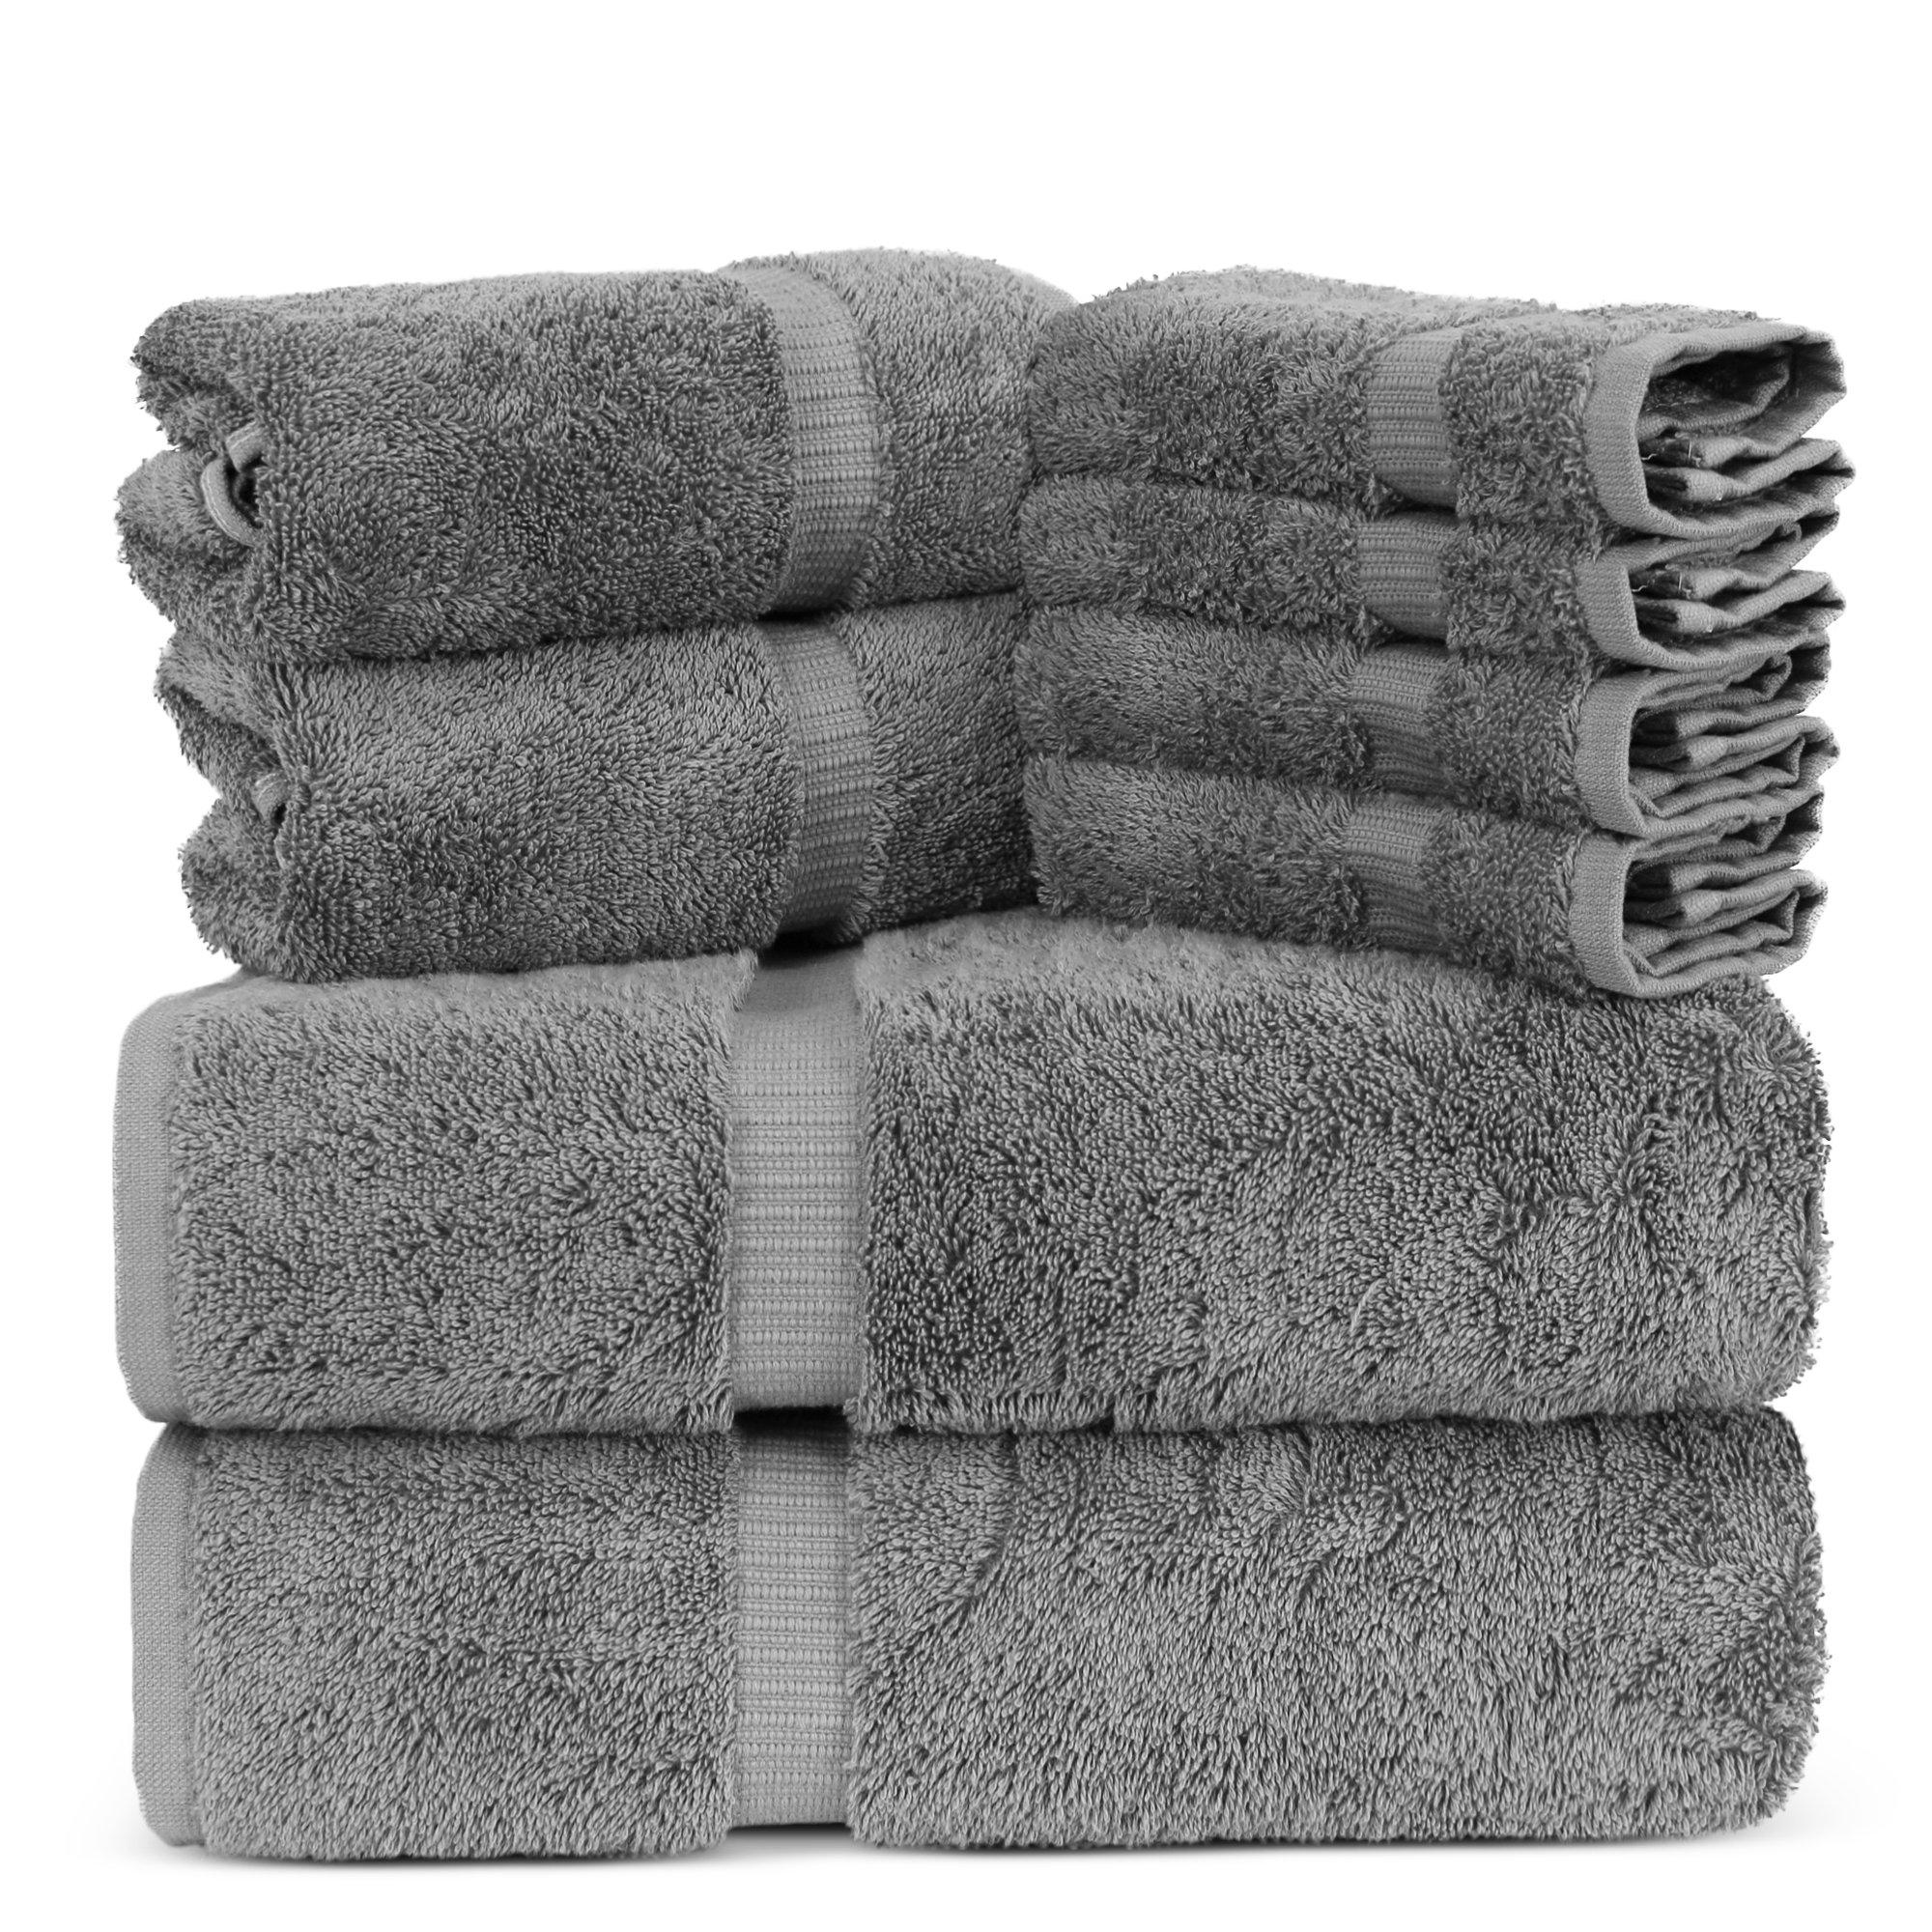 Towel Bazaar Luxury Hotel and Spa Quality 100% Premium Turkish Cotton 8 Pieces Eco-Friendly Kitchen and Bathroom Towel Set (2 x Bath Towels, 2 x Hand Towels, 4 x Wash Cloths, Gray)